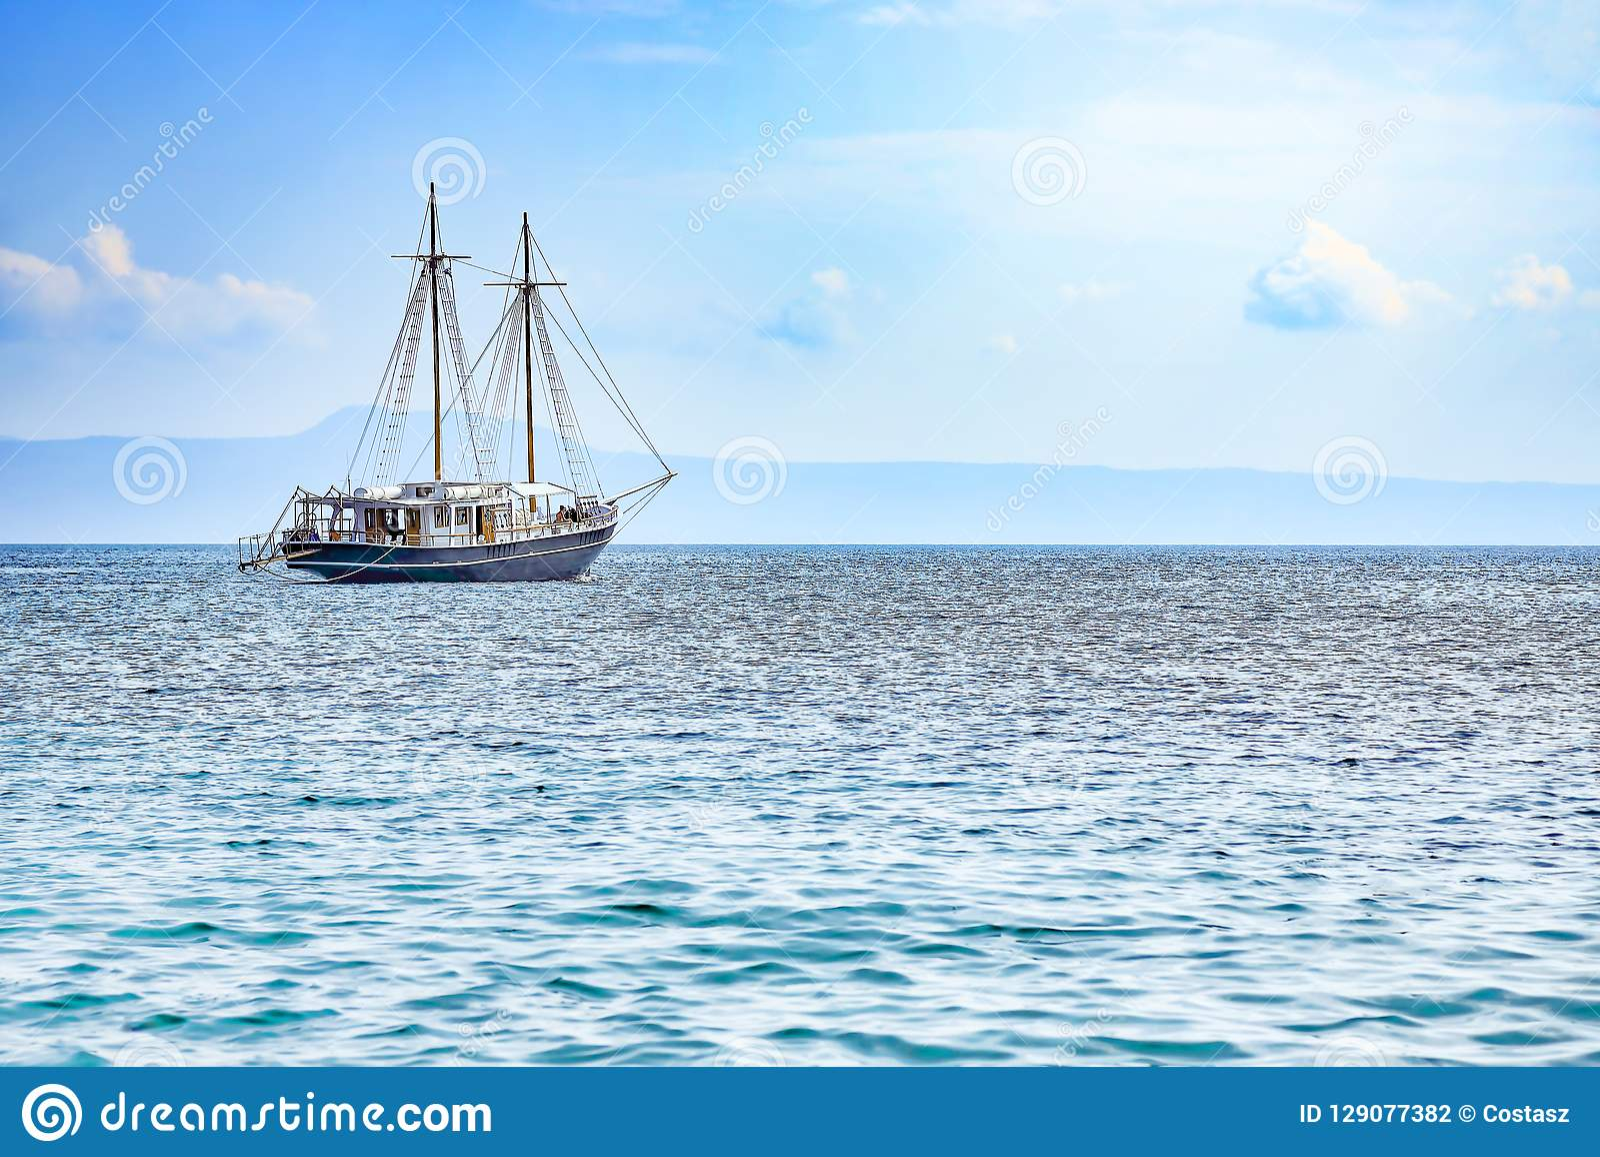 Sailboat at sea stock photo. Image of relax, perfect ...